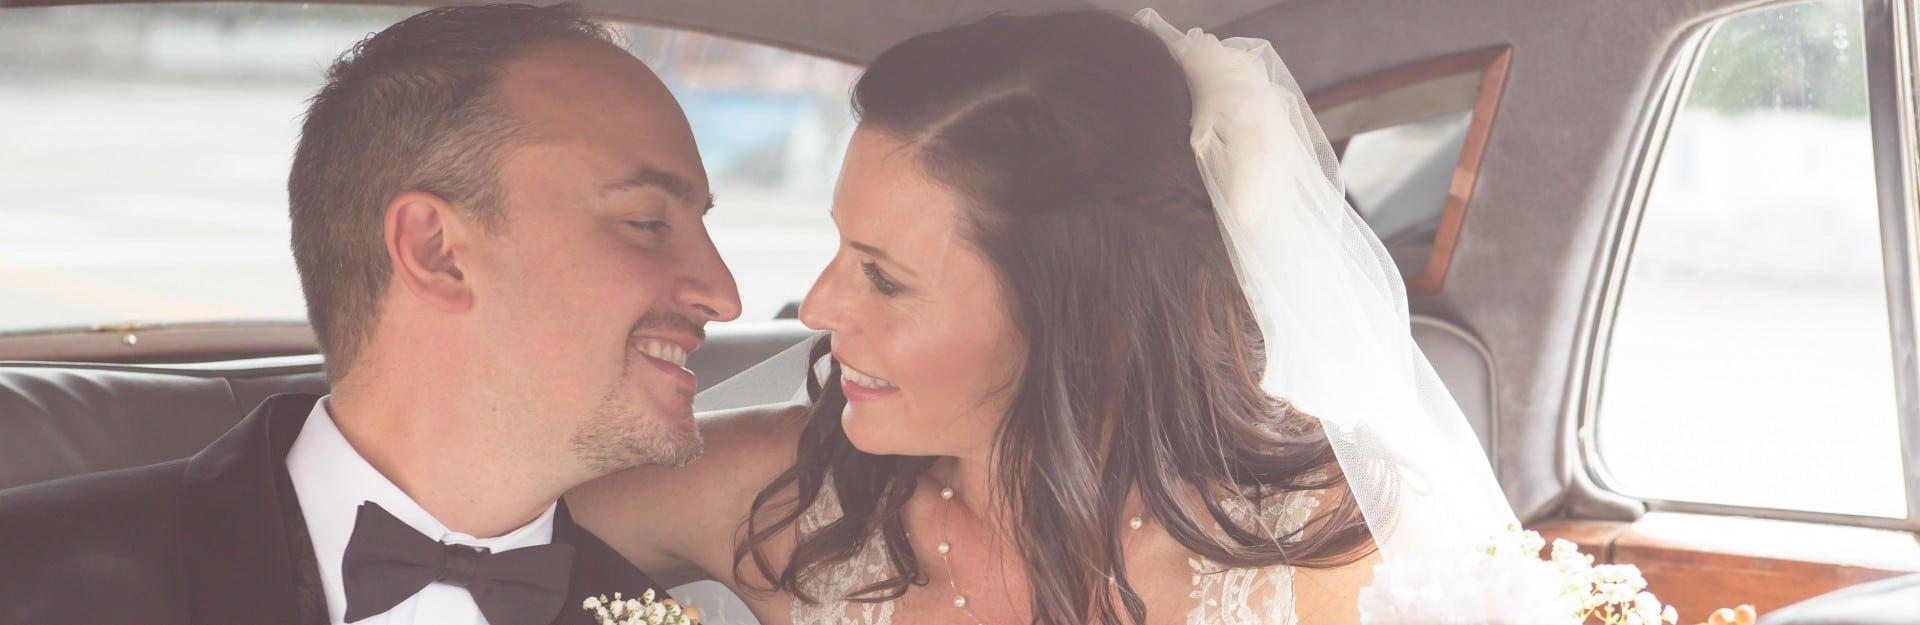 San Antonio Wedding Planning and Wedding Photography at The Veranda